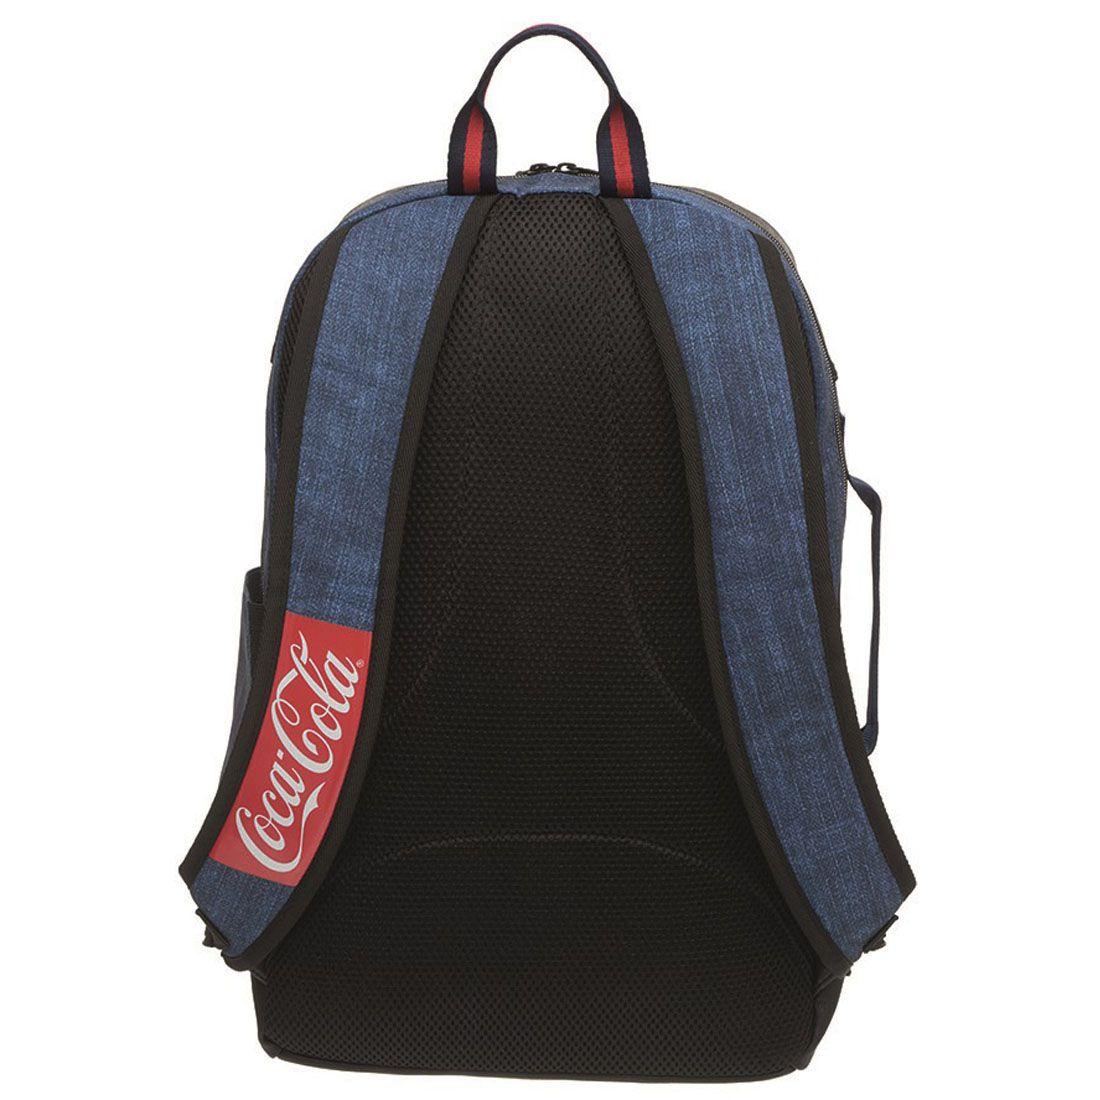 Mochila Coca Cola Denim Pro Jeans Azul